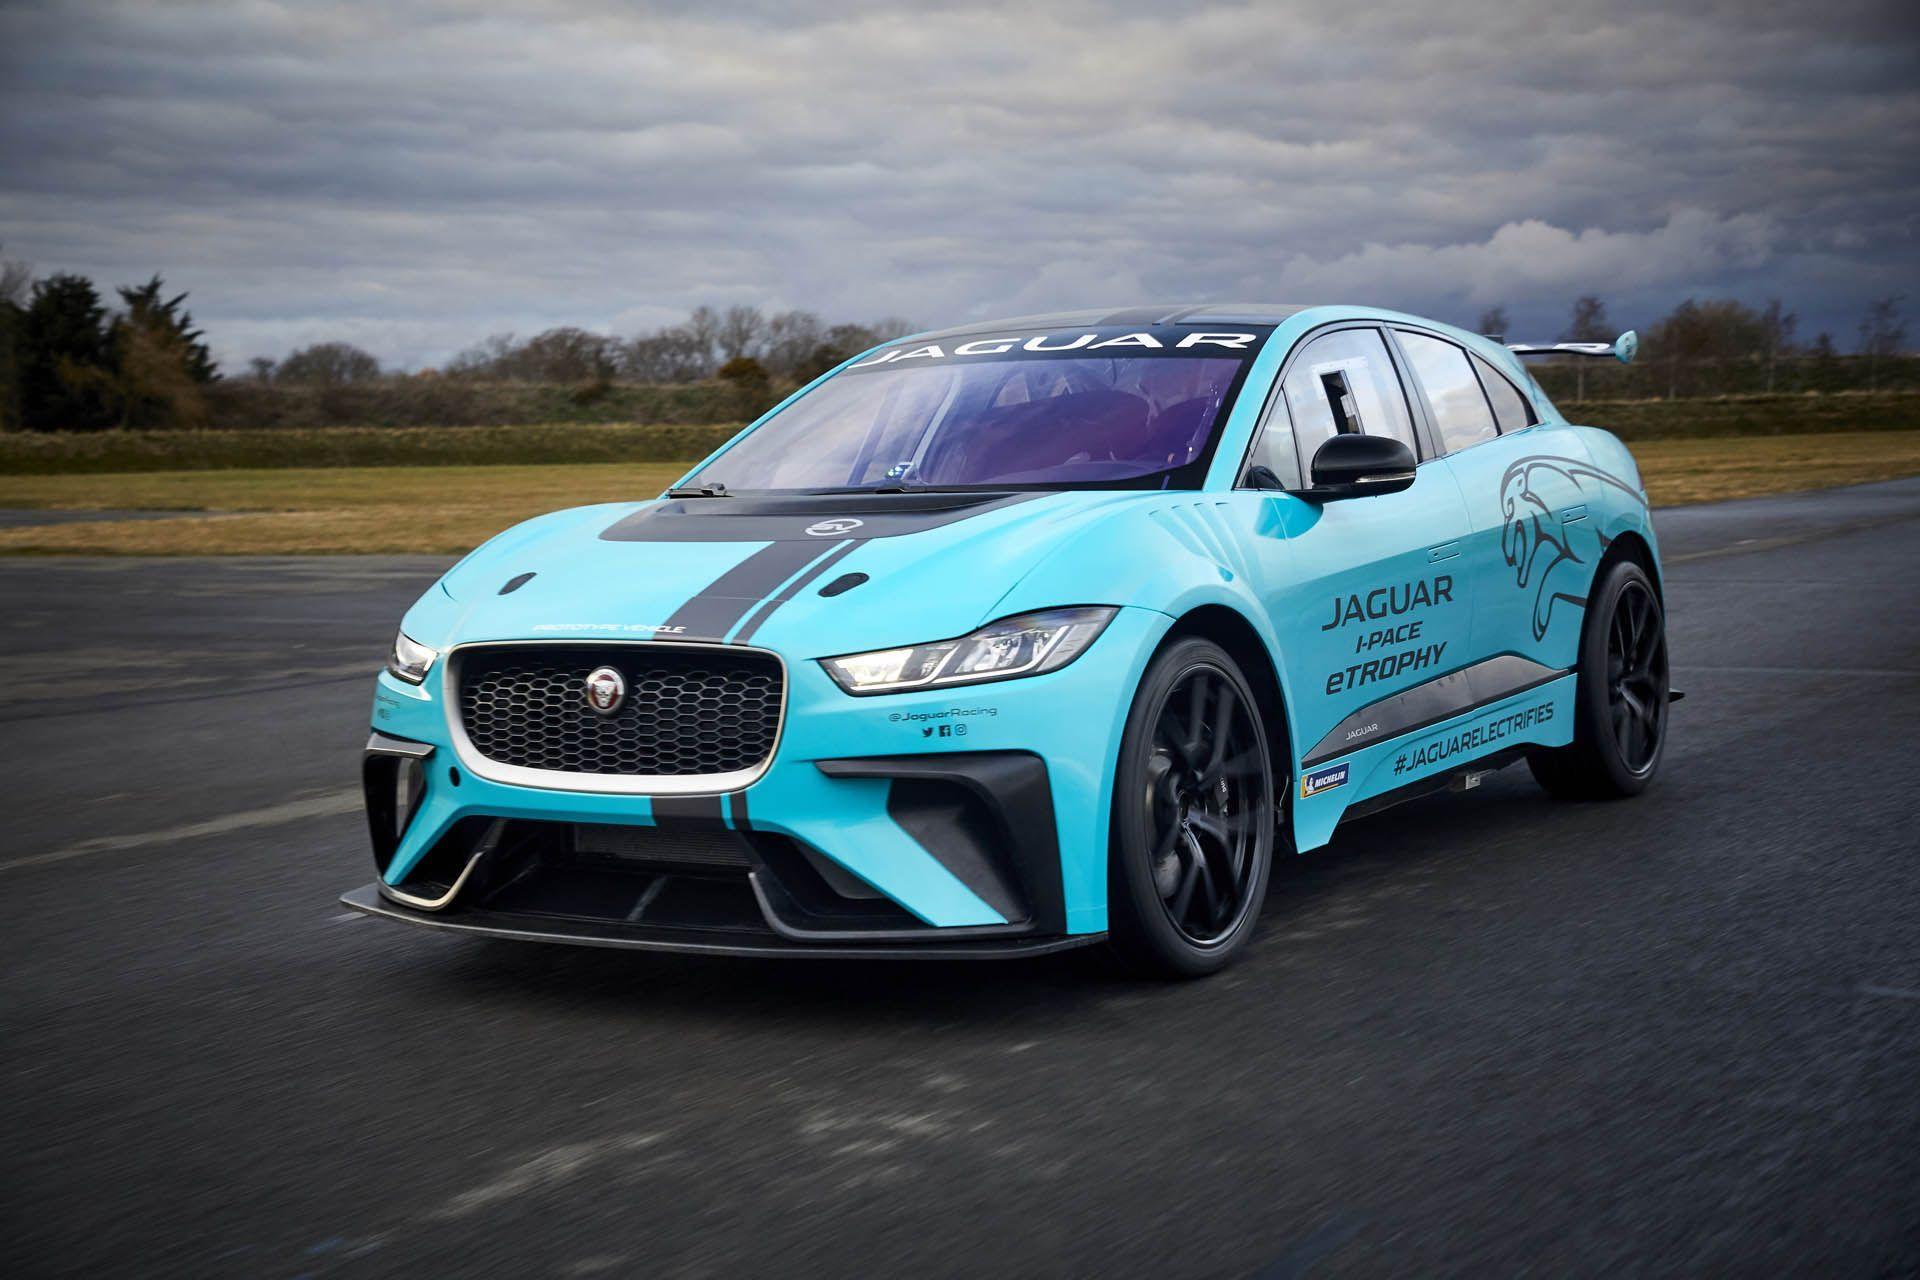 Jaguar I Pace Svr Would Focus On Handling Not Straight Line Speed Carscoops Jaguar I Pace Jaguar Jaguar Pace